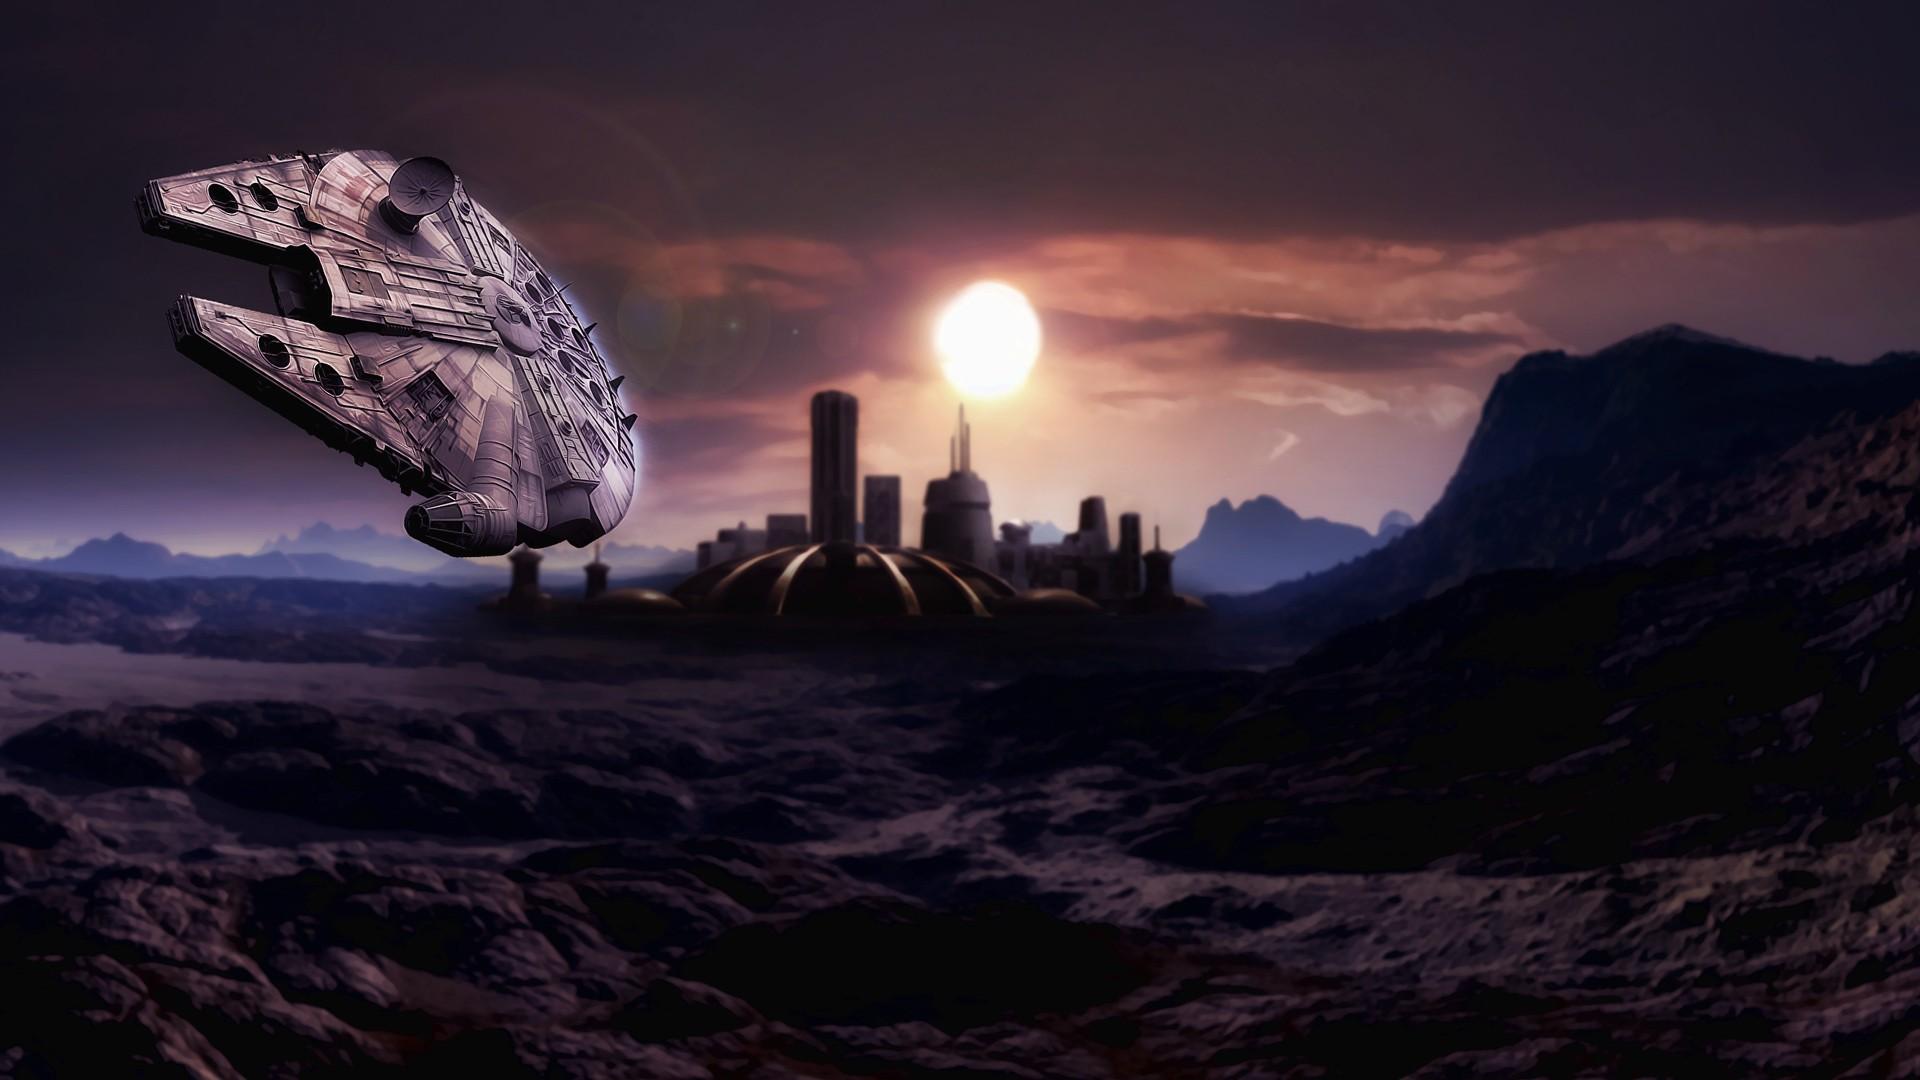 Анимация фантастика про космос и космические корабли путешествия